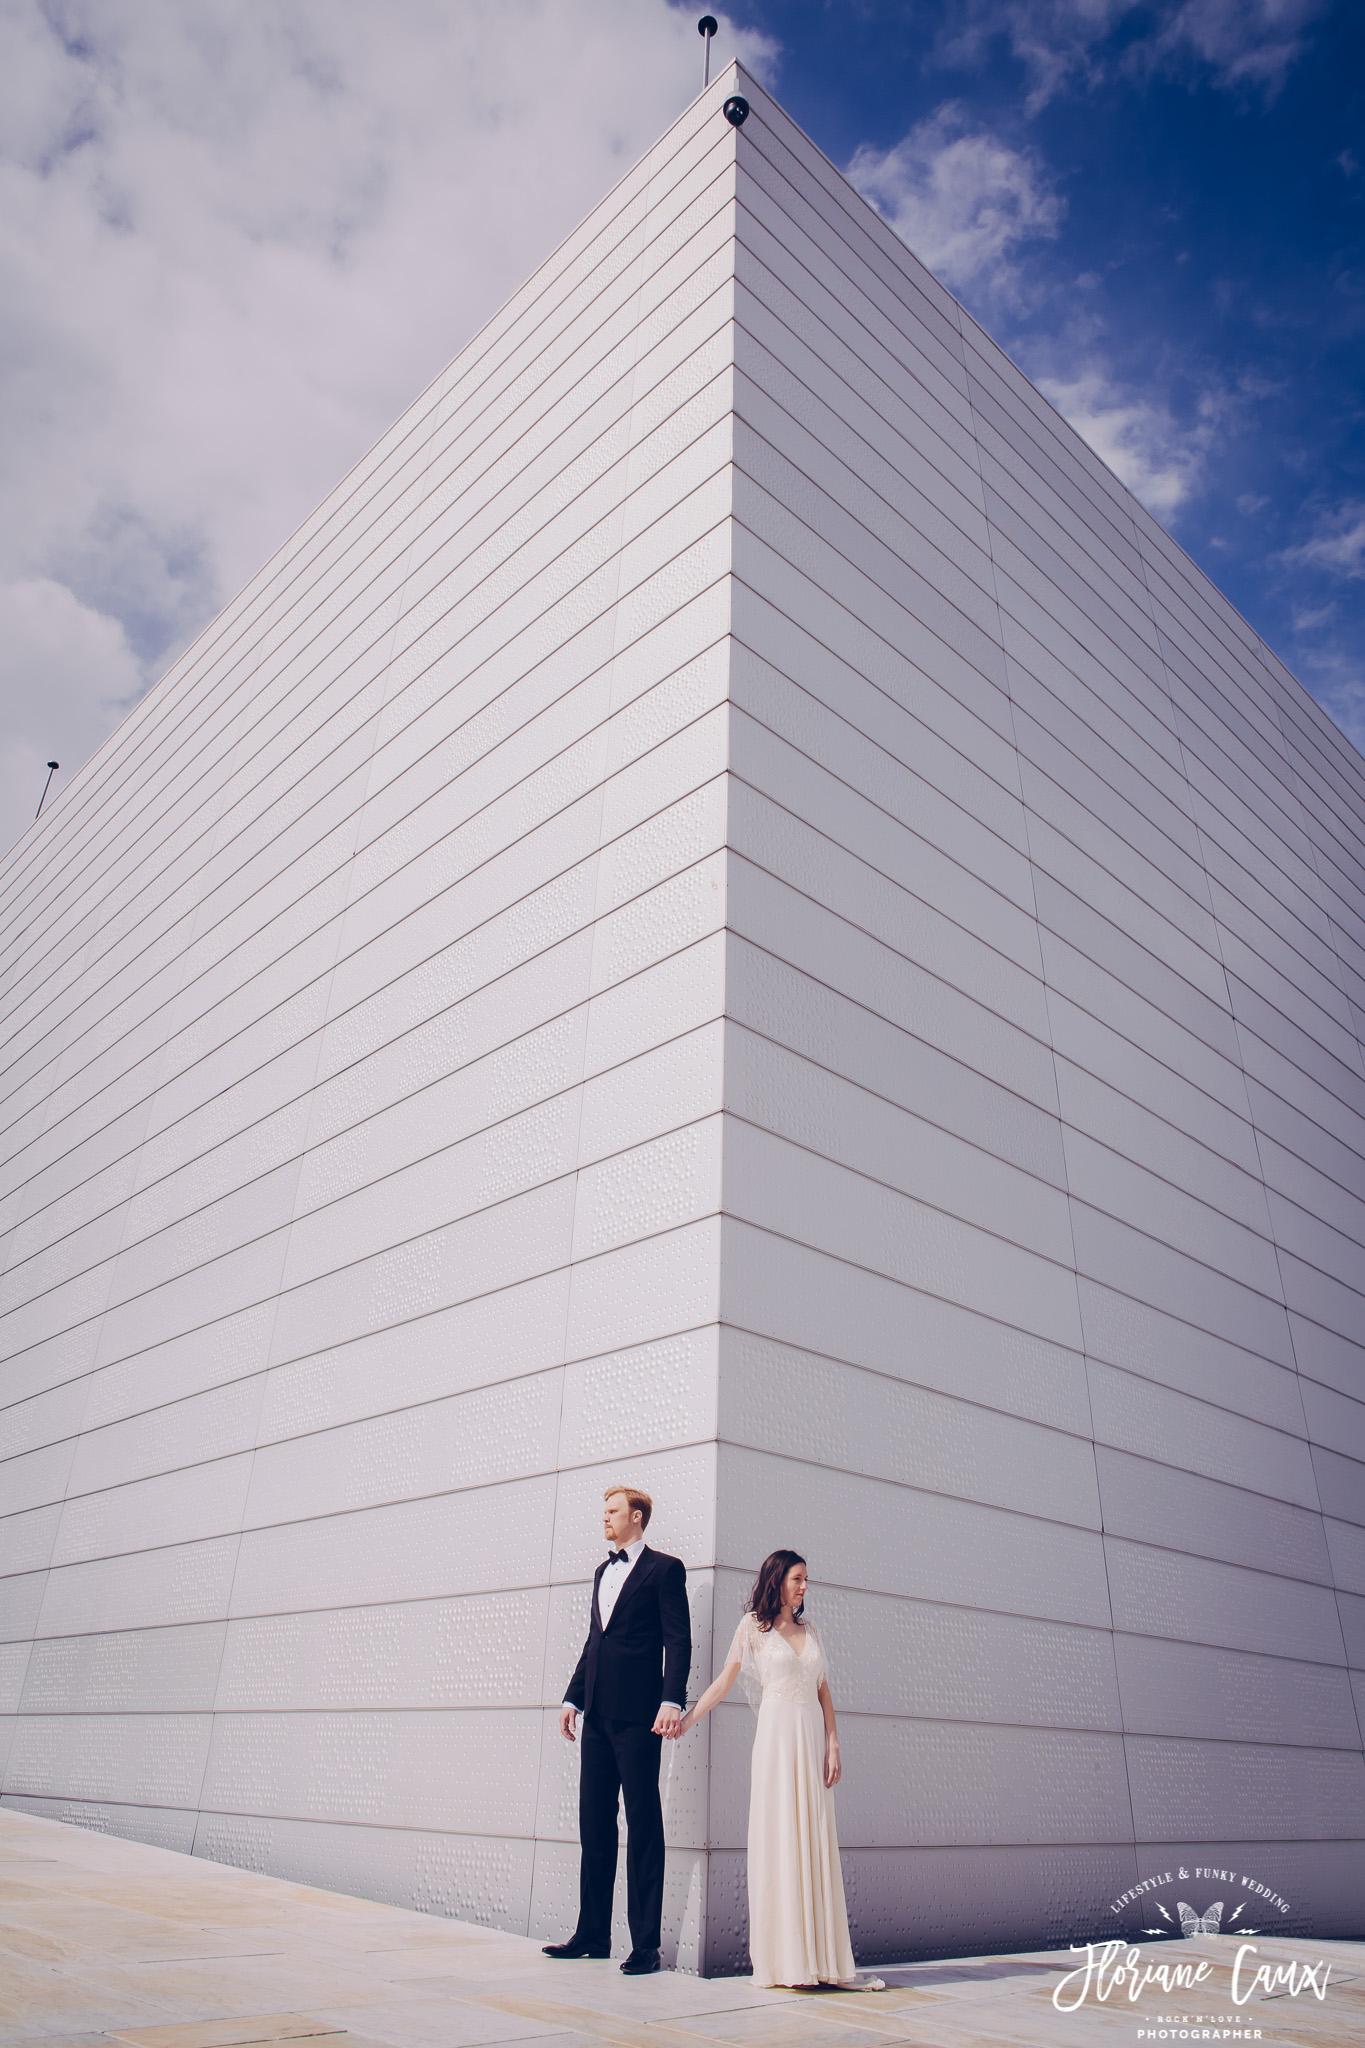 destination-wedding-photographer-oslo-norway-floriane-caux-67